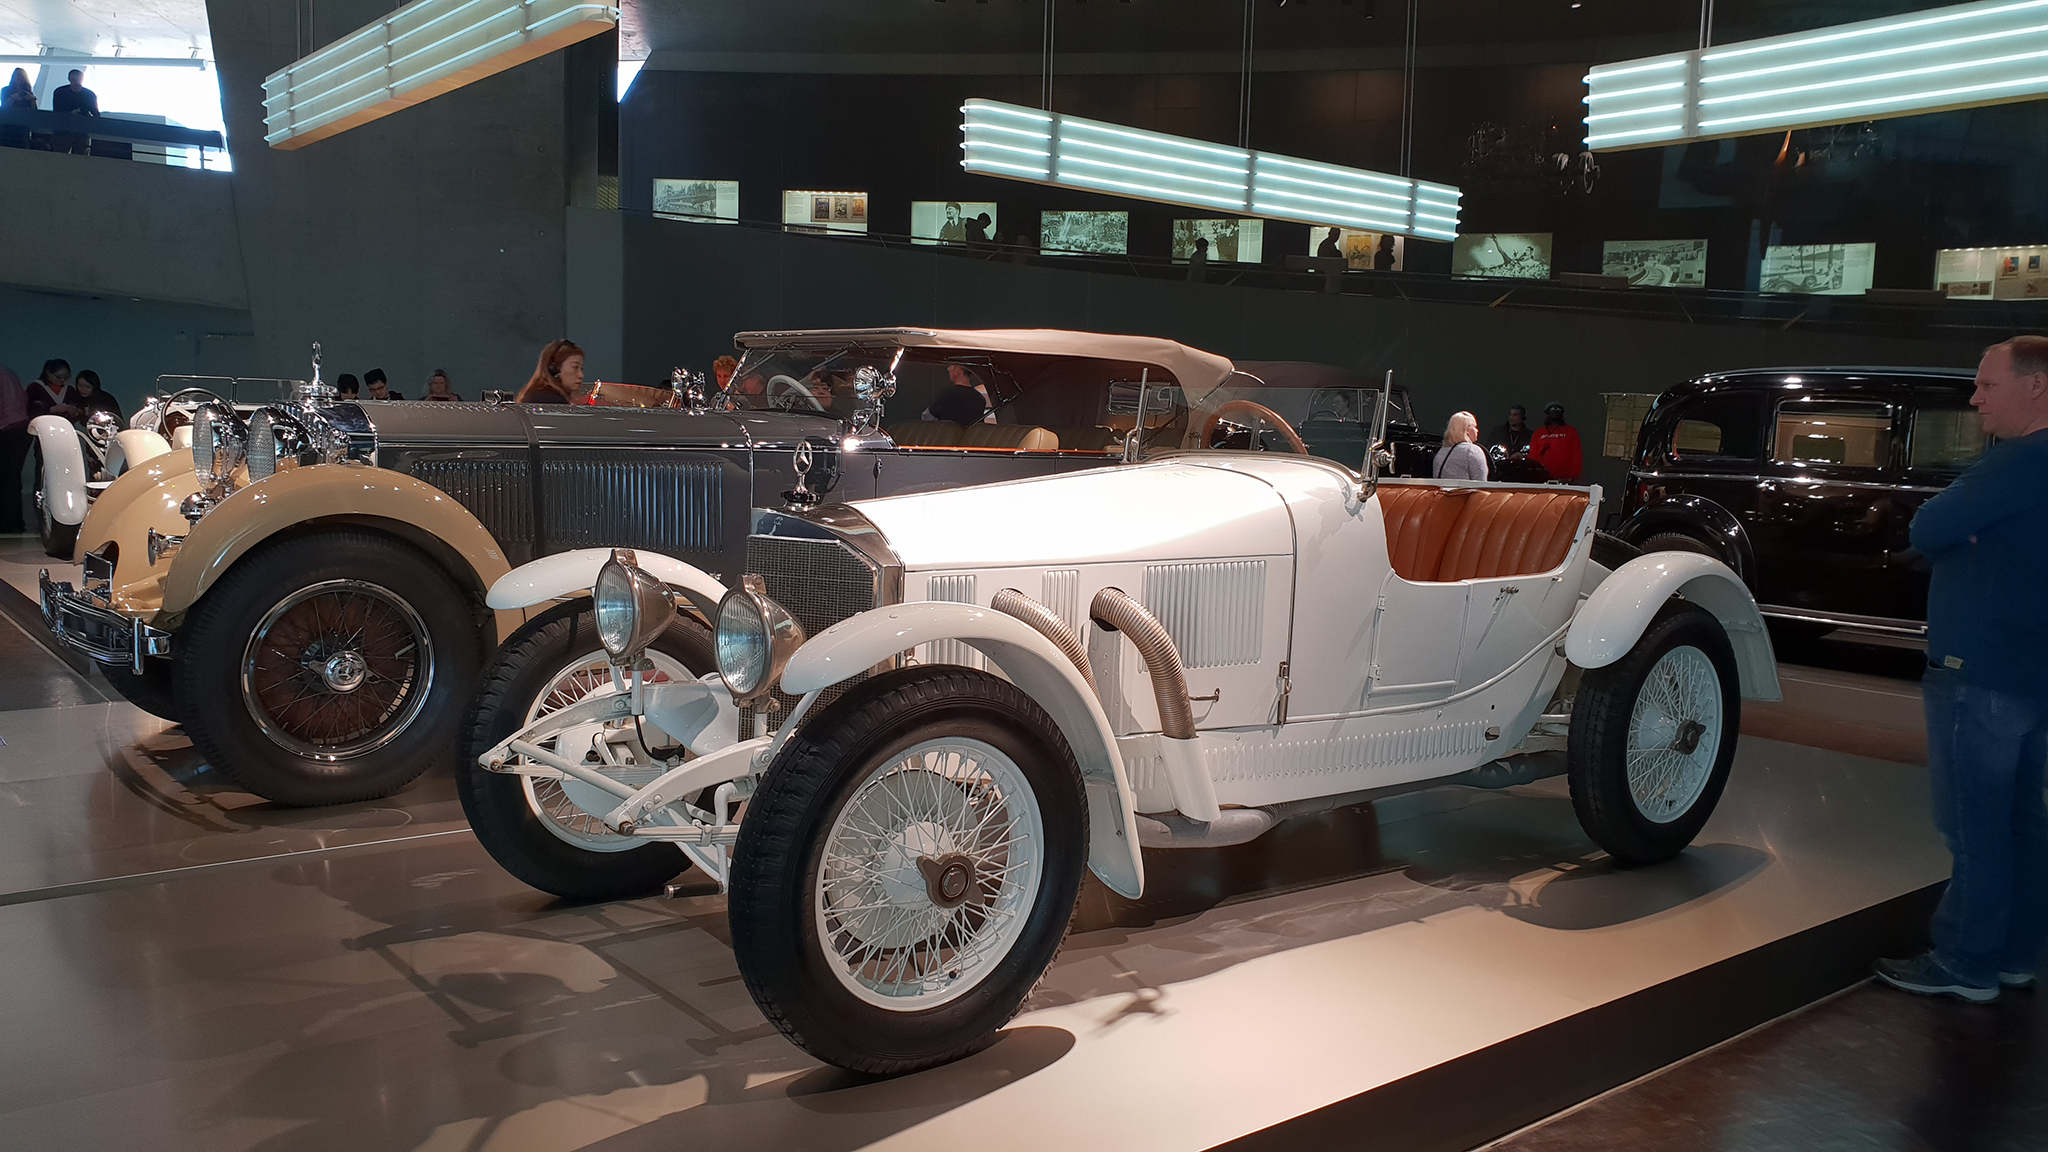 S9-Mercedes-Benz Museum-tinhte-72.jpg